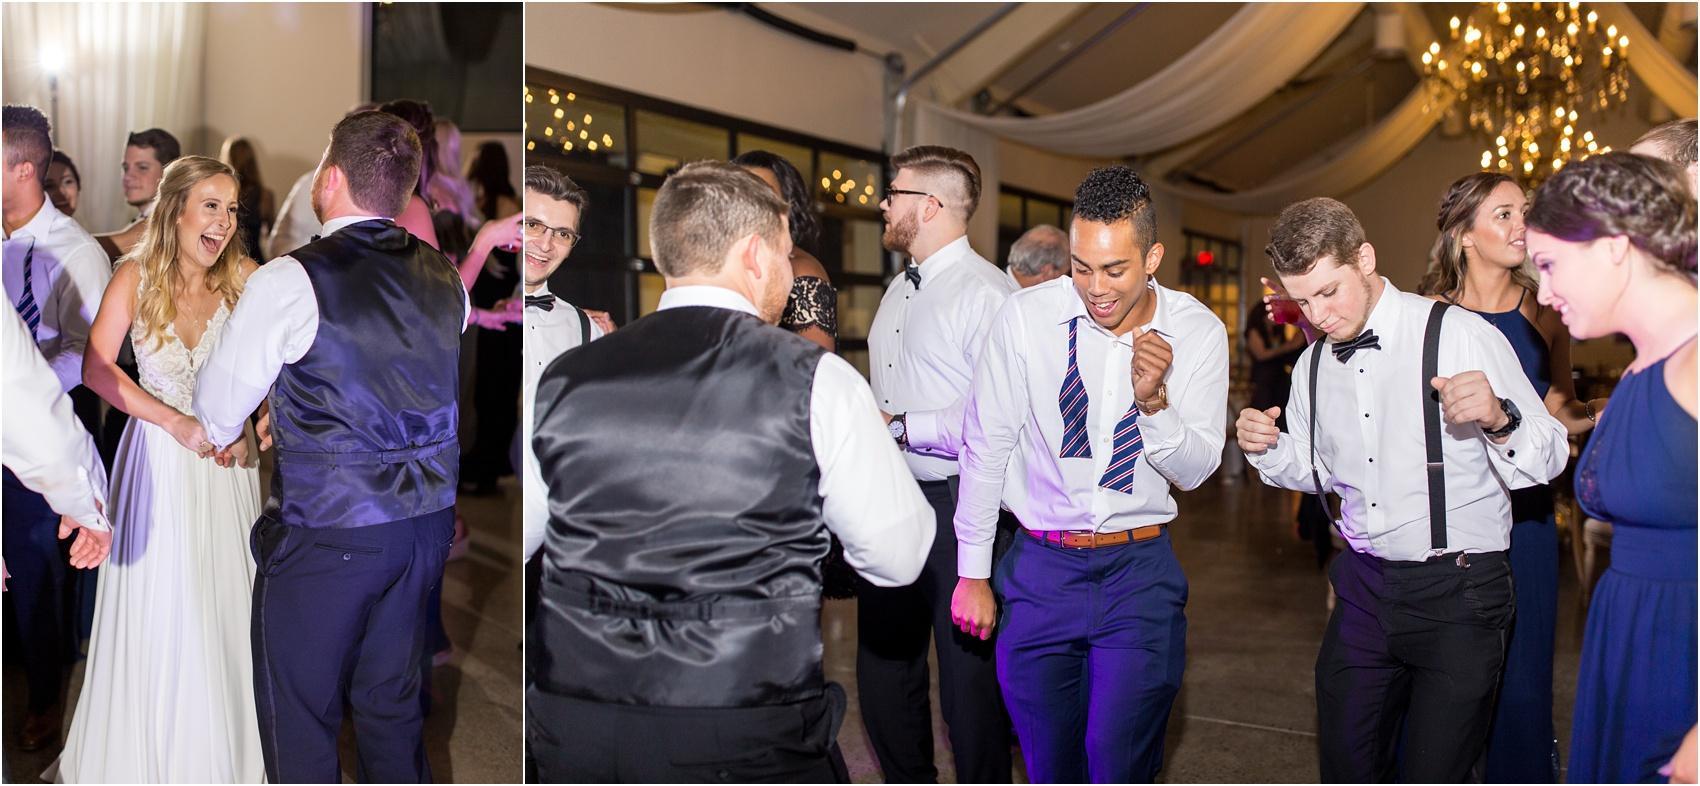 Savannah Eve Photography- Jurek-Woodworth Wedding- Sneak Peek-99.jpg